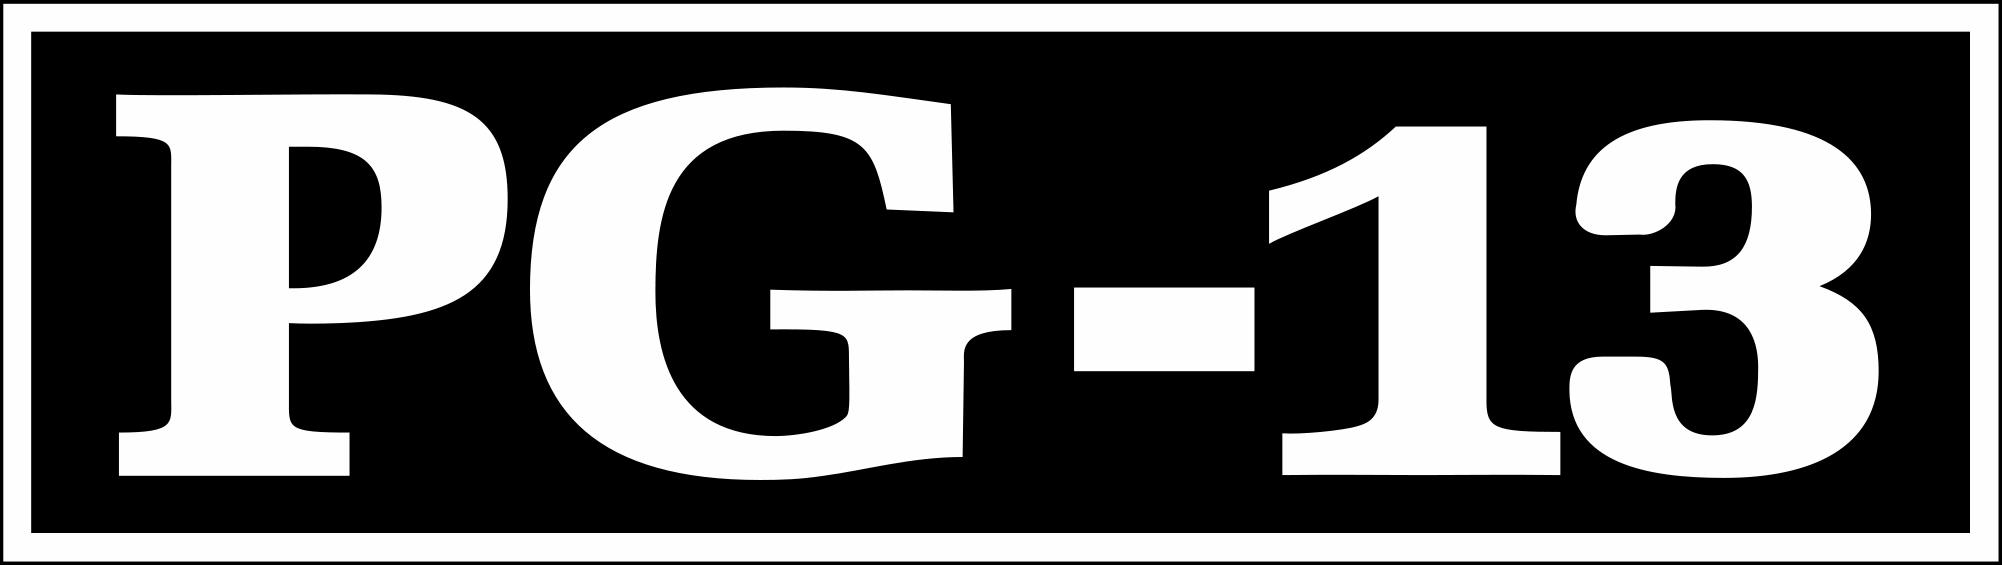 rated pg 13 logos rh logolynx com pg13 logo nba pg13 logo